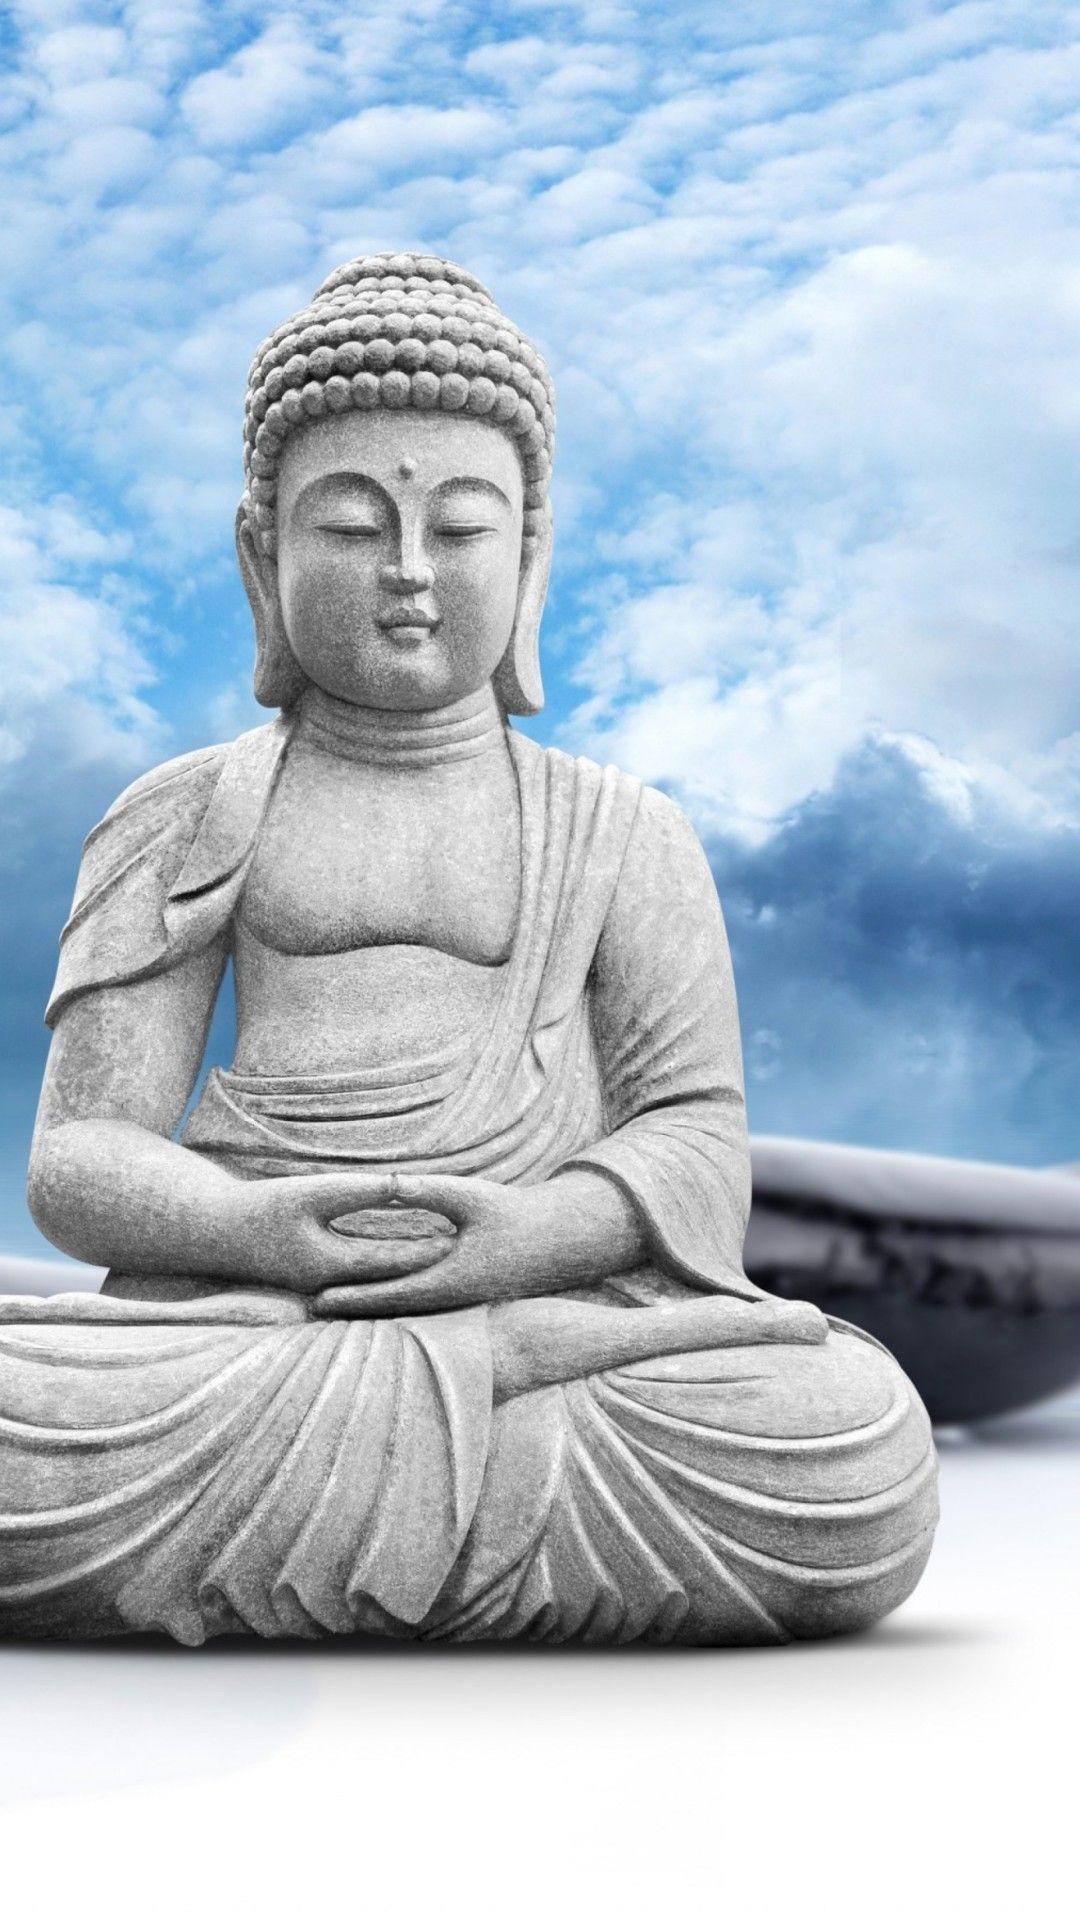 Buddha Iphone Wallpaper 57 Images Buddha Wallpaper Iphone Lord Buddha Wallpapers Buddha Statue